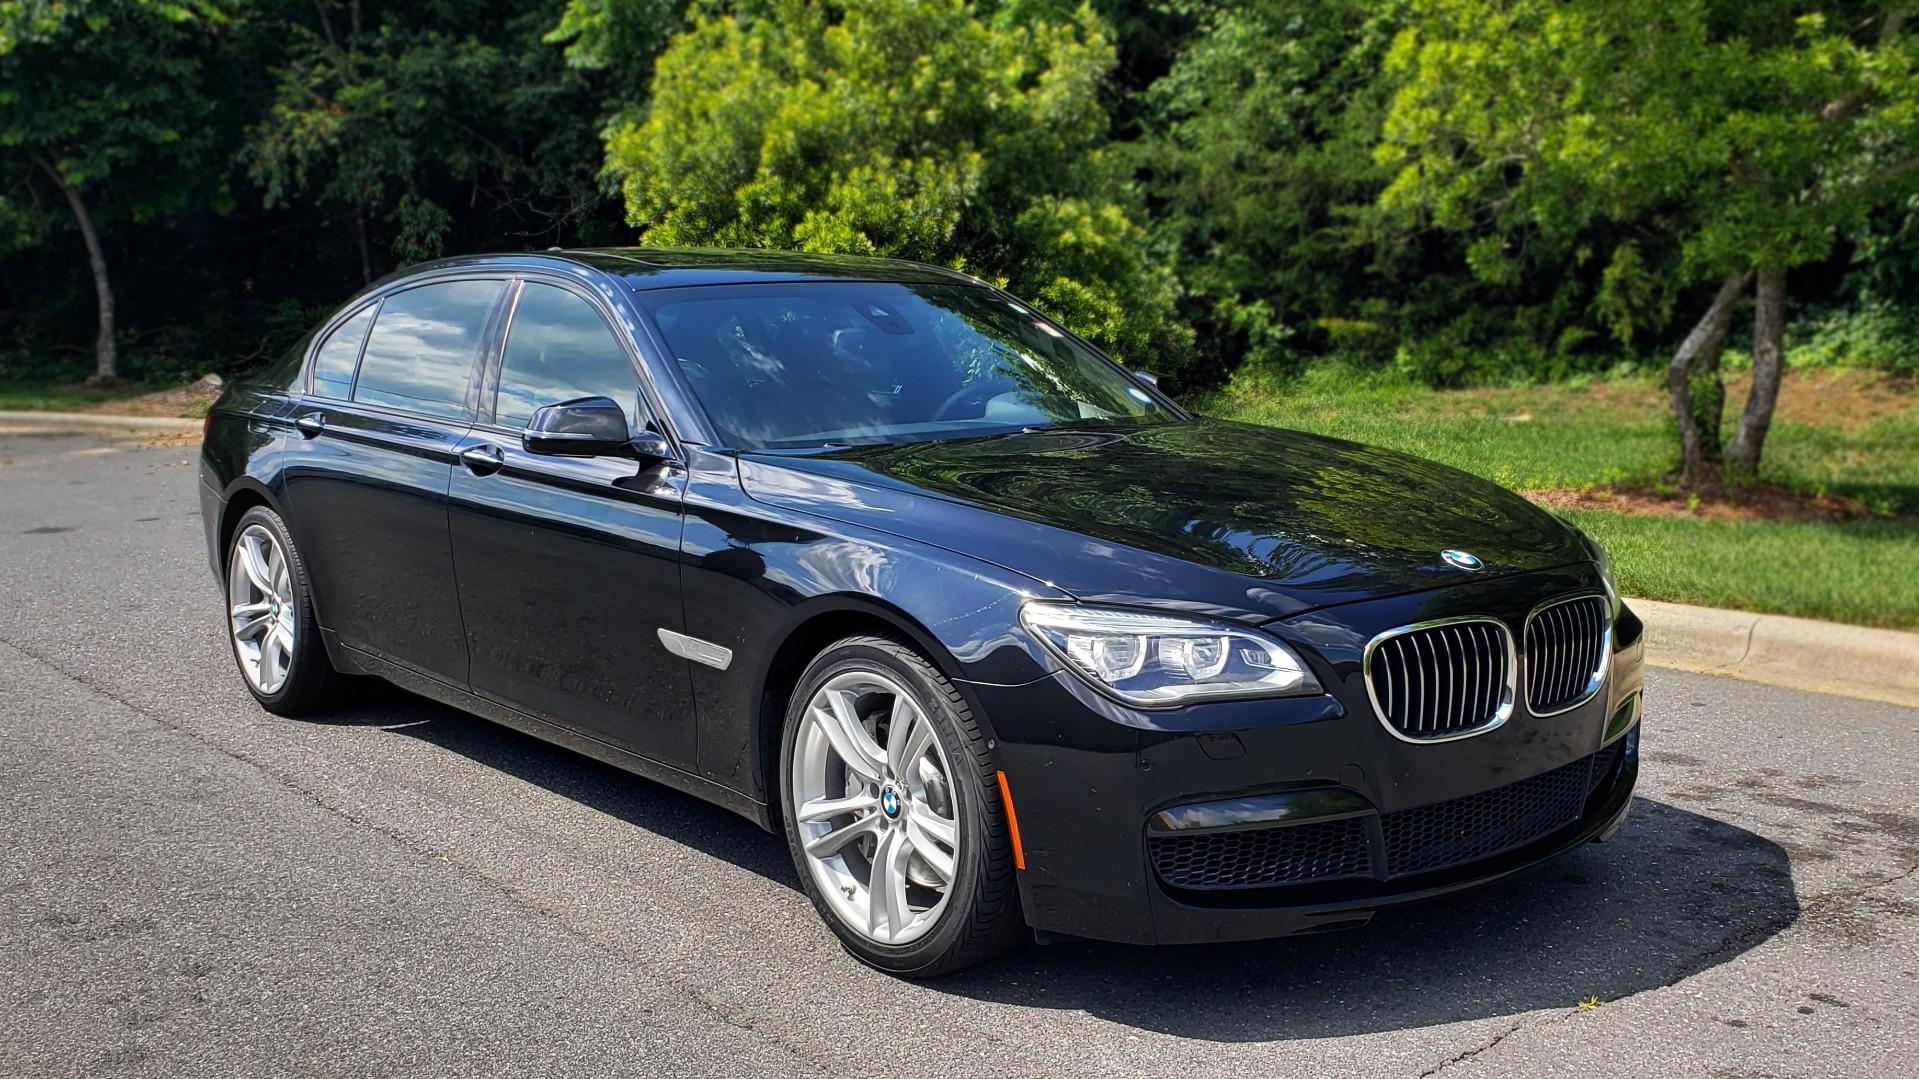 Used 2014 BMW 7 SERIES 750LI M-SPORT / EXEC PKG / DRVR ASST / LIGHTING / NAV / SUNROOF for sale Sold at Formula Imports in Charlotte NC 28227 4